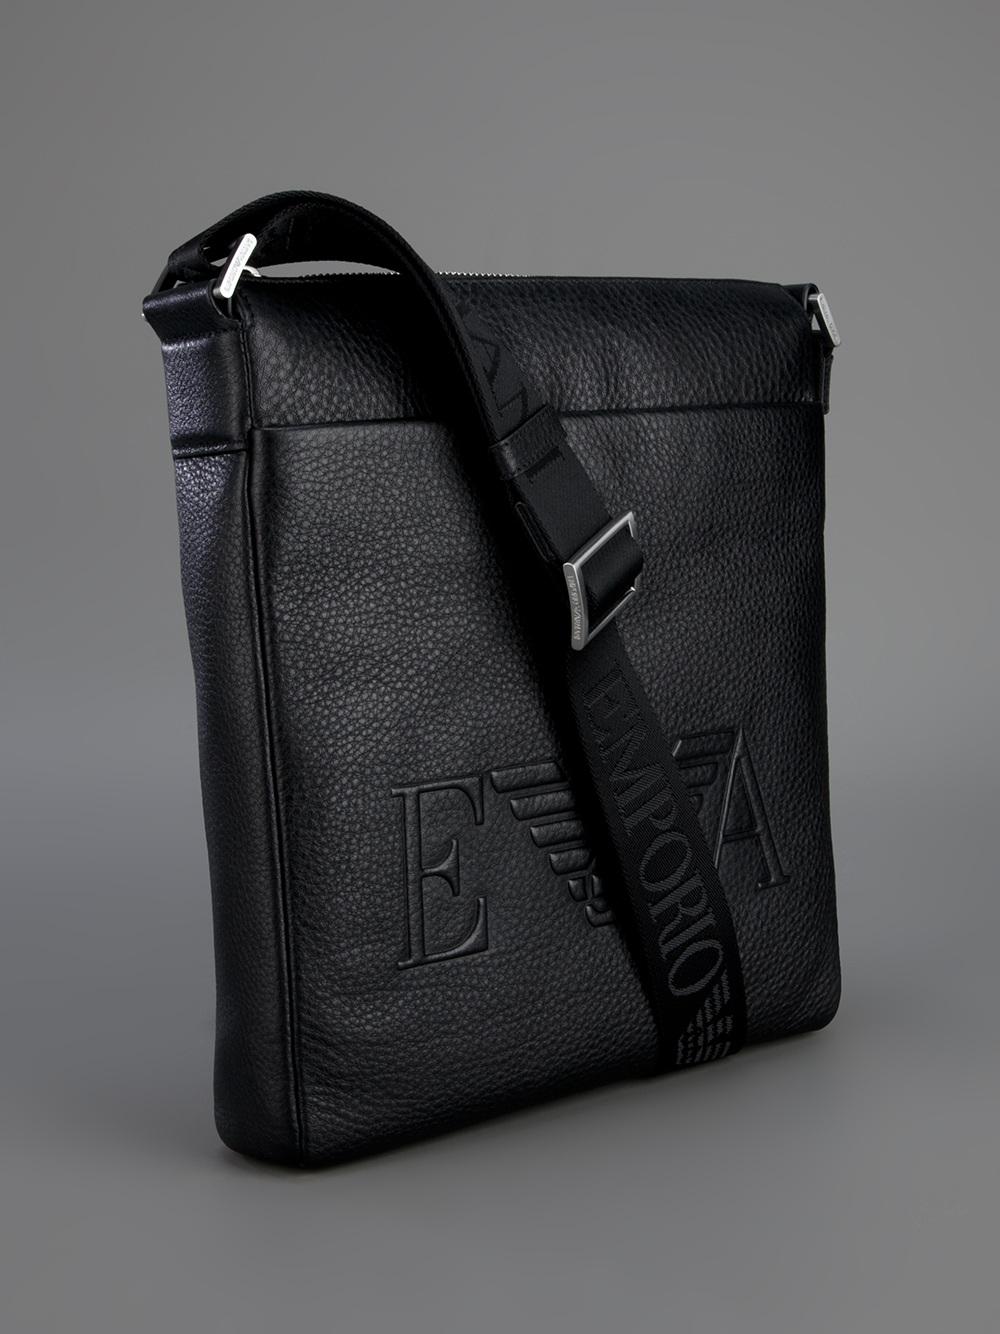 Lyst - Emporio Armani Messenger Bag in Black for Men 3b93c85a210f5